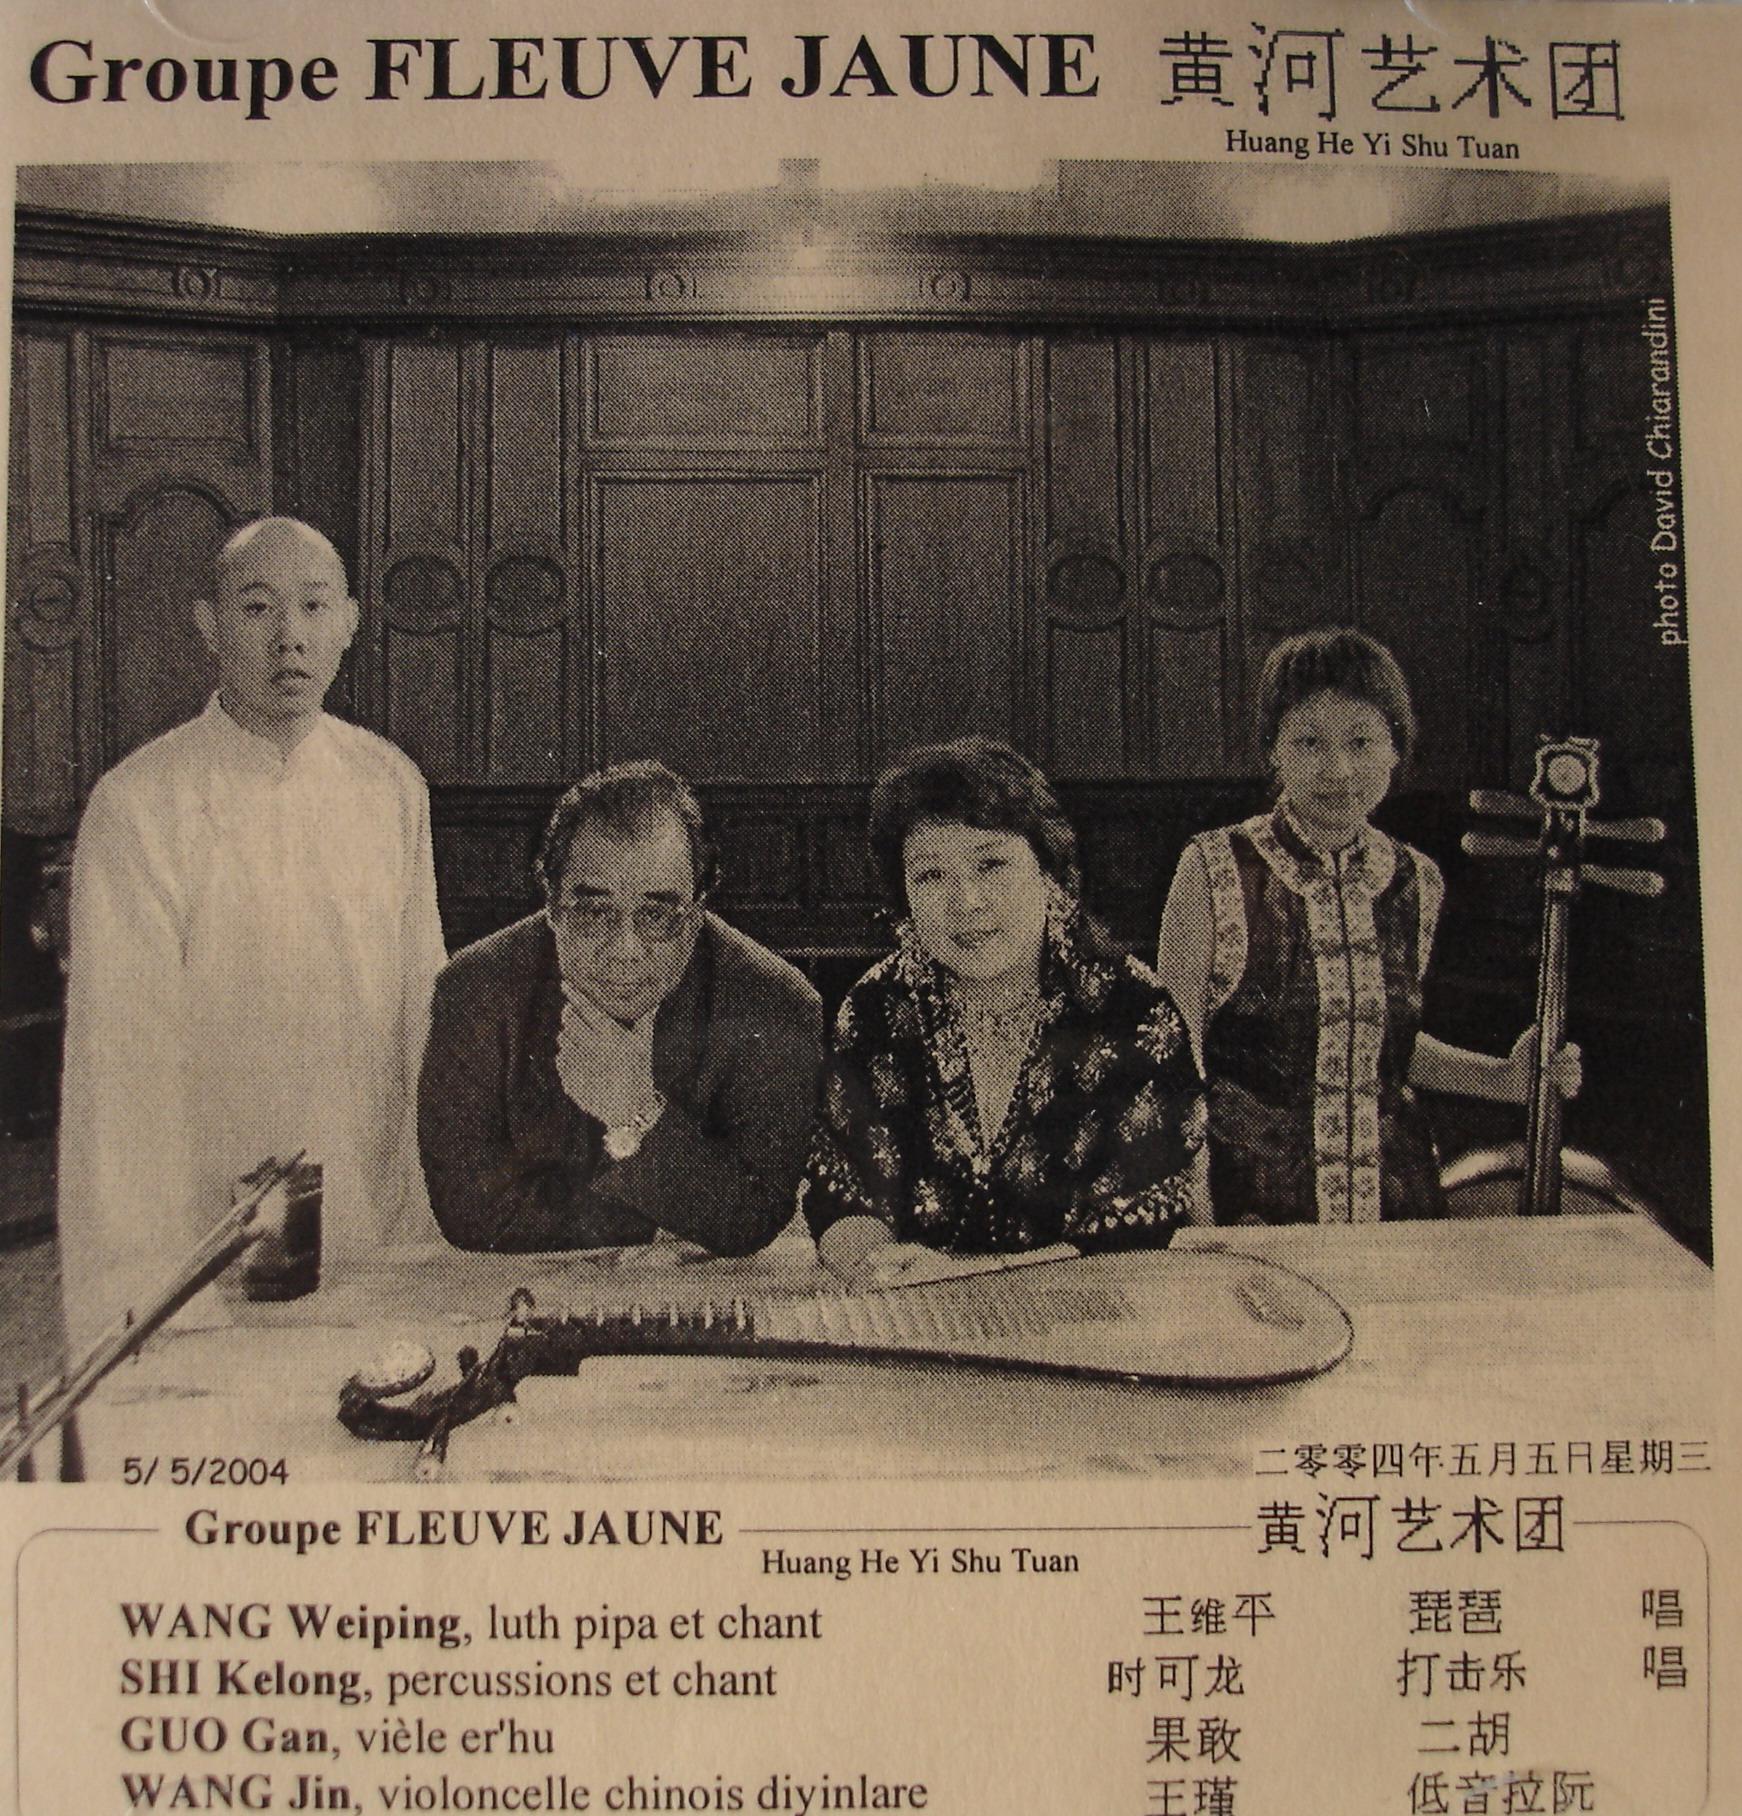 Group Fleuve Jaune